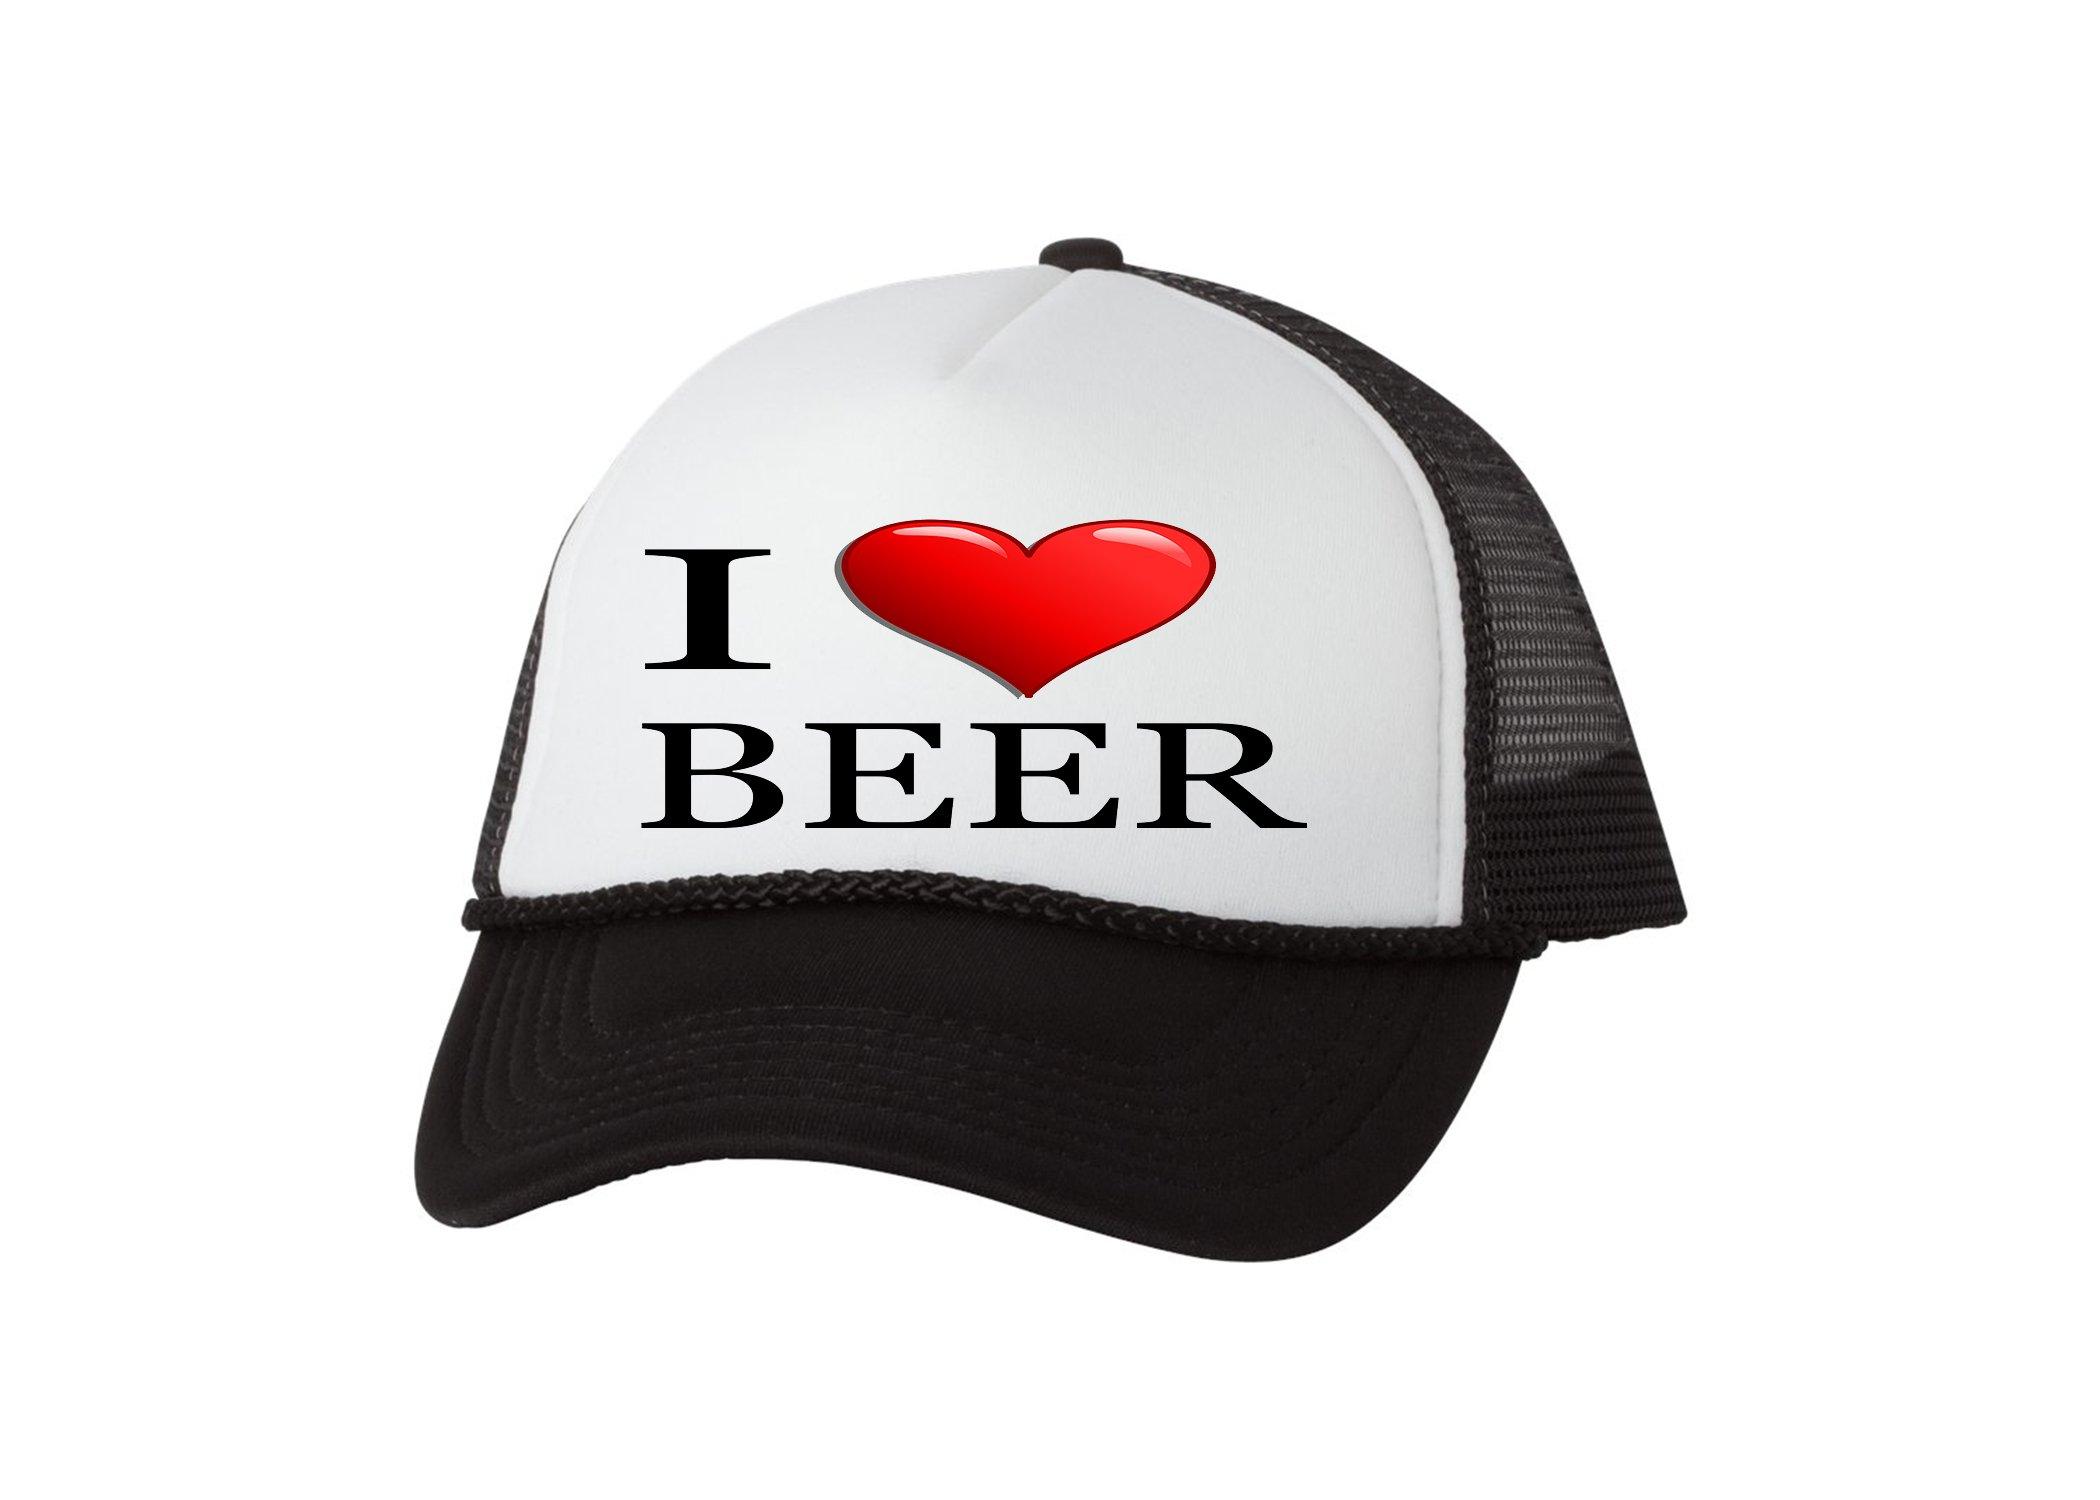 67b2884b2 Rogue River Tactical Funny Trucker Hat I Love Beer Baseball Cap Retro  Vintage Joke Heart Alcohol Drinking (Black)